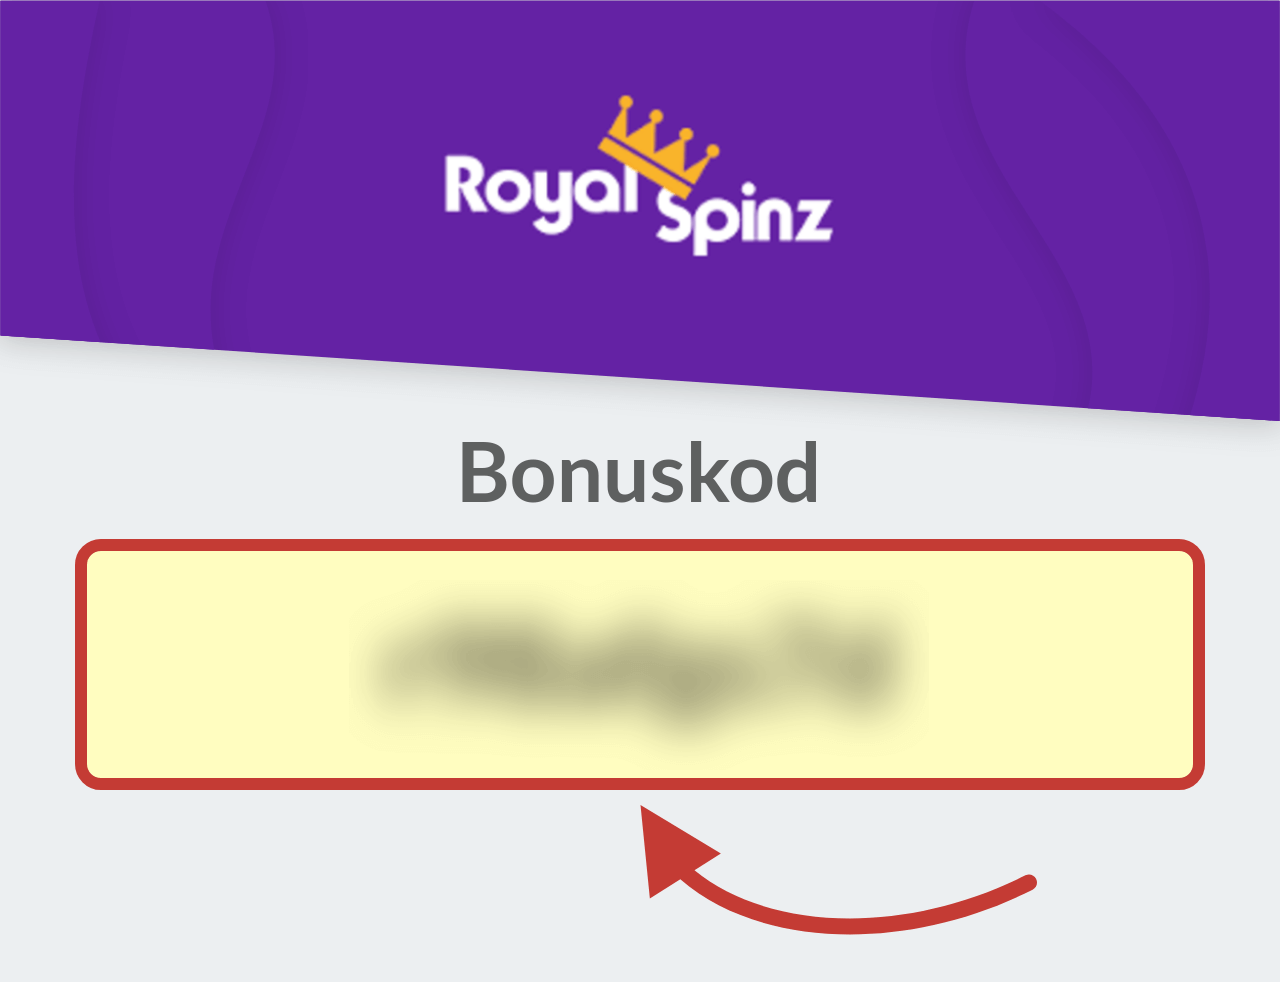 RoyalSpinz Casino Bonuskod